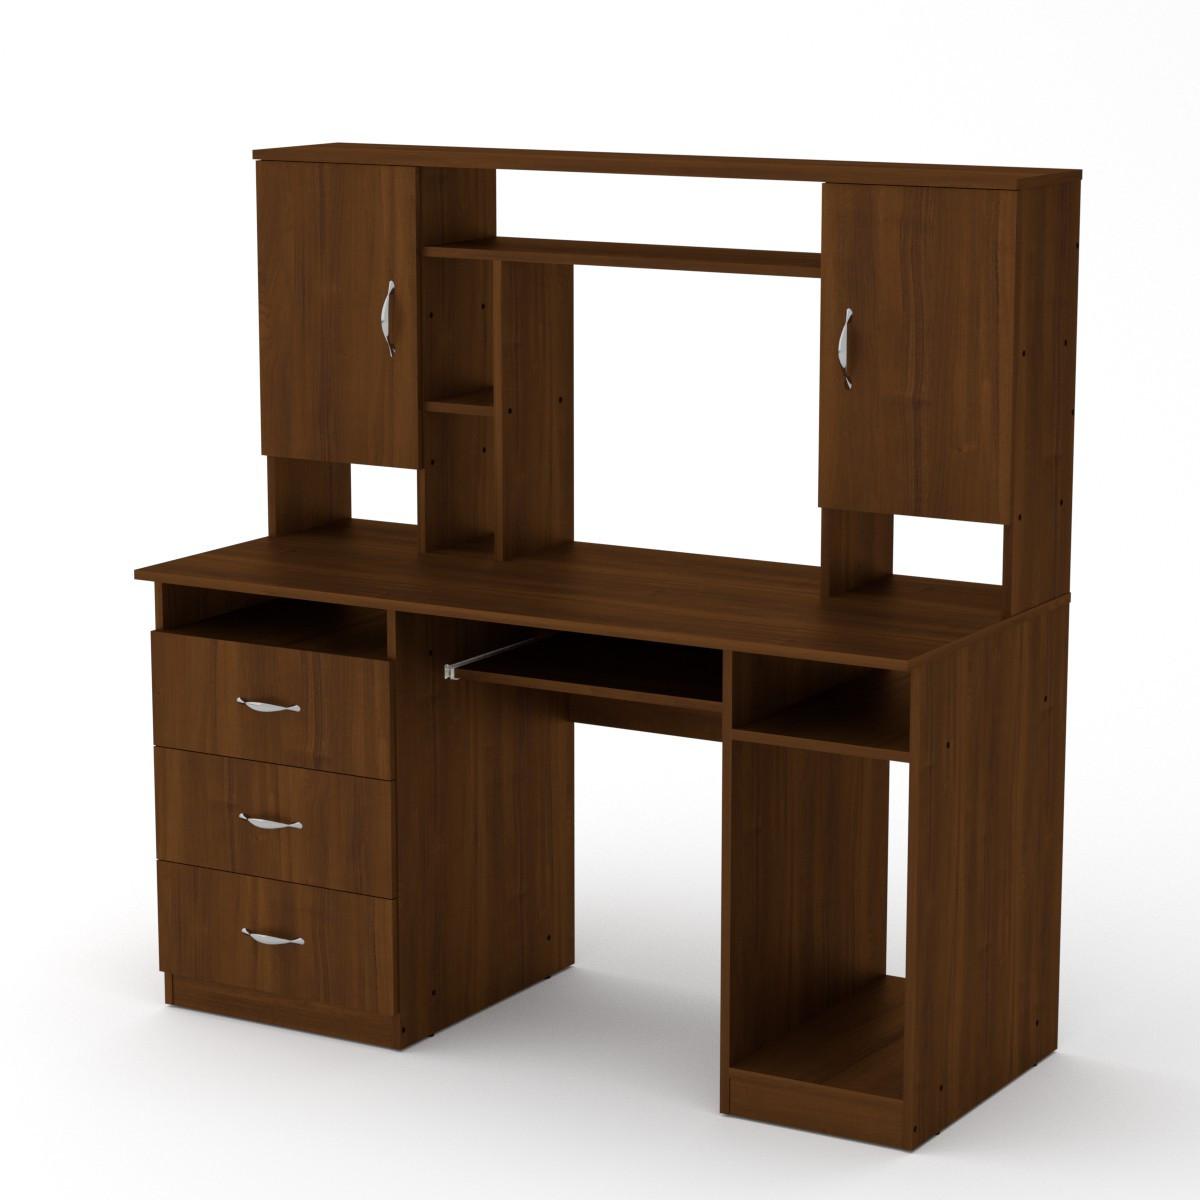 Стол компьютерный менеджер орех экко Компанит (140х60х142 см)